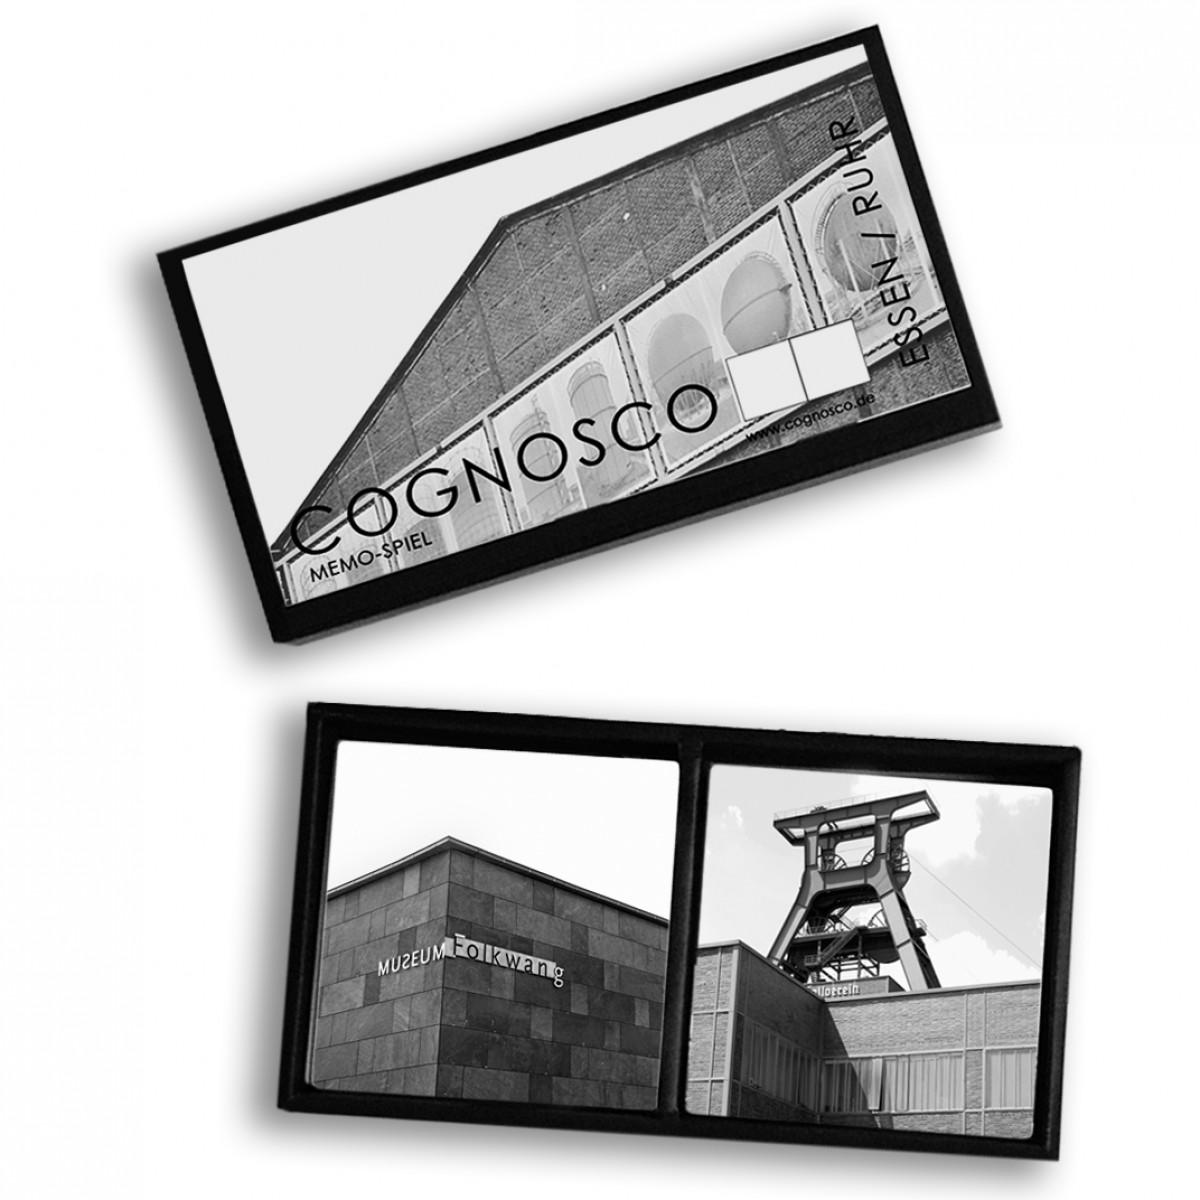 COGNOSCO Memo-Spiel Essen/Ruhrgebiet